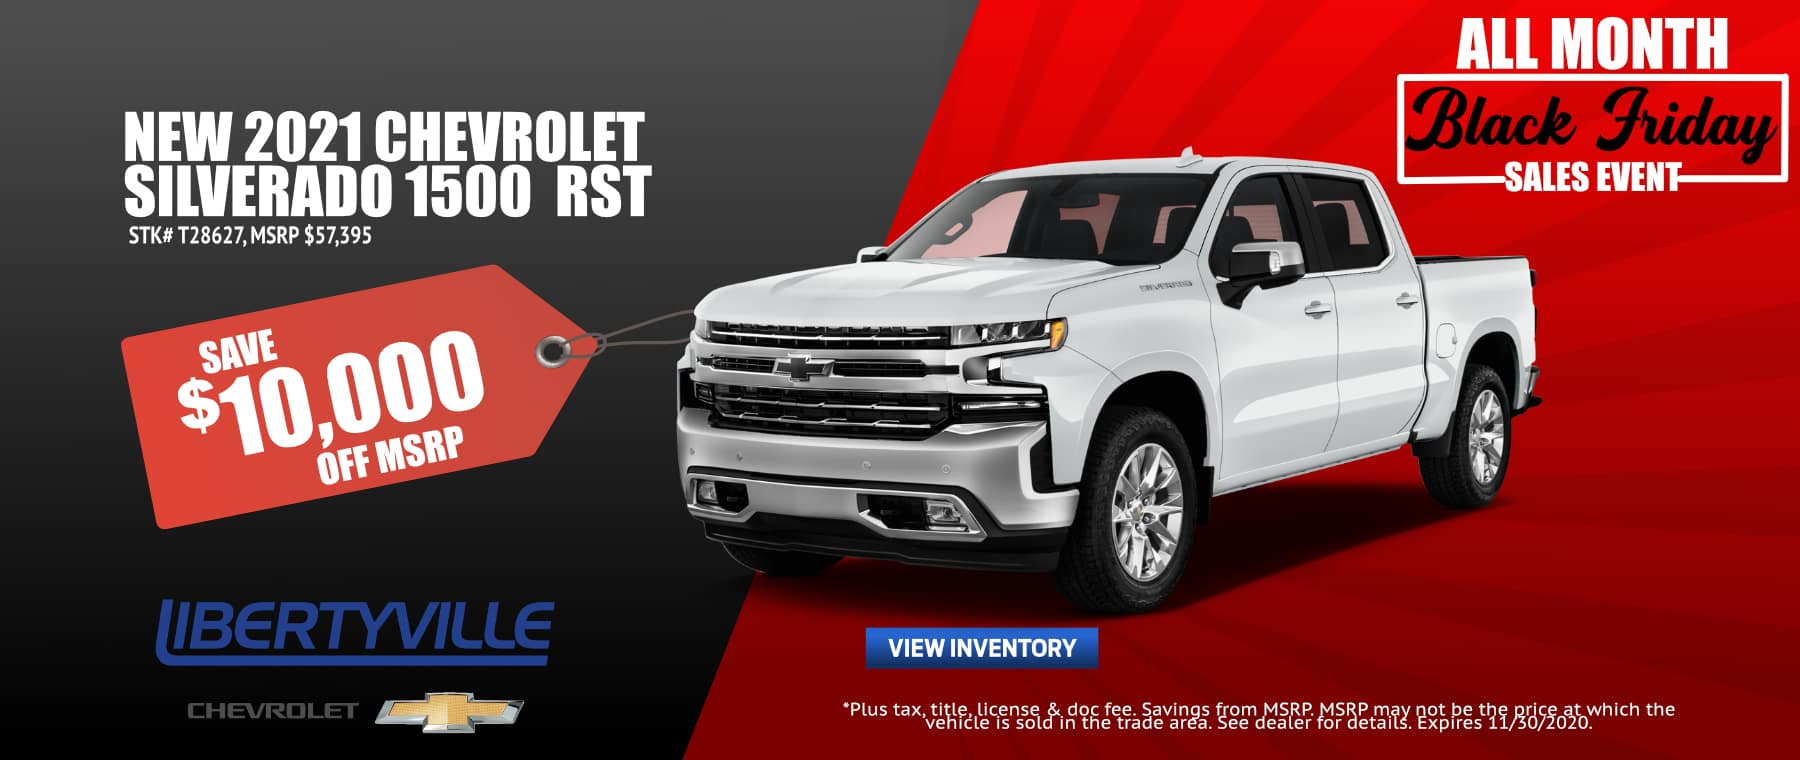 November-2020_Silverado_RST_LIbertyville Chevrolet_